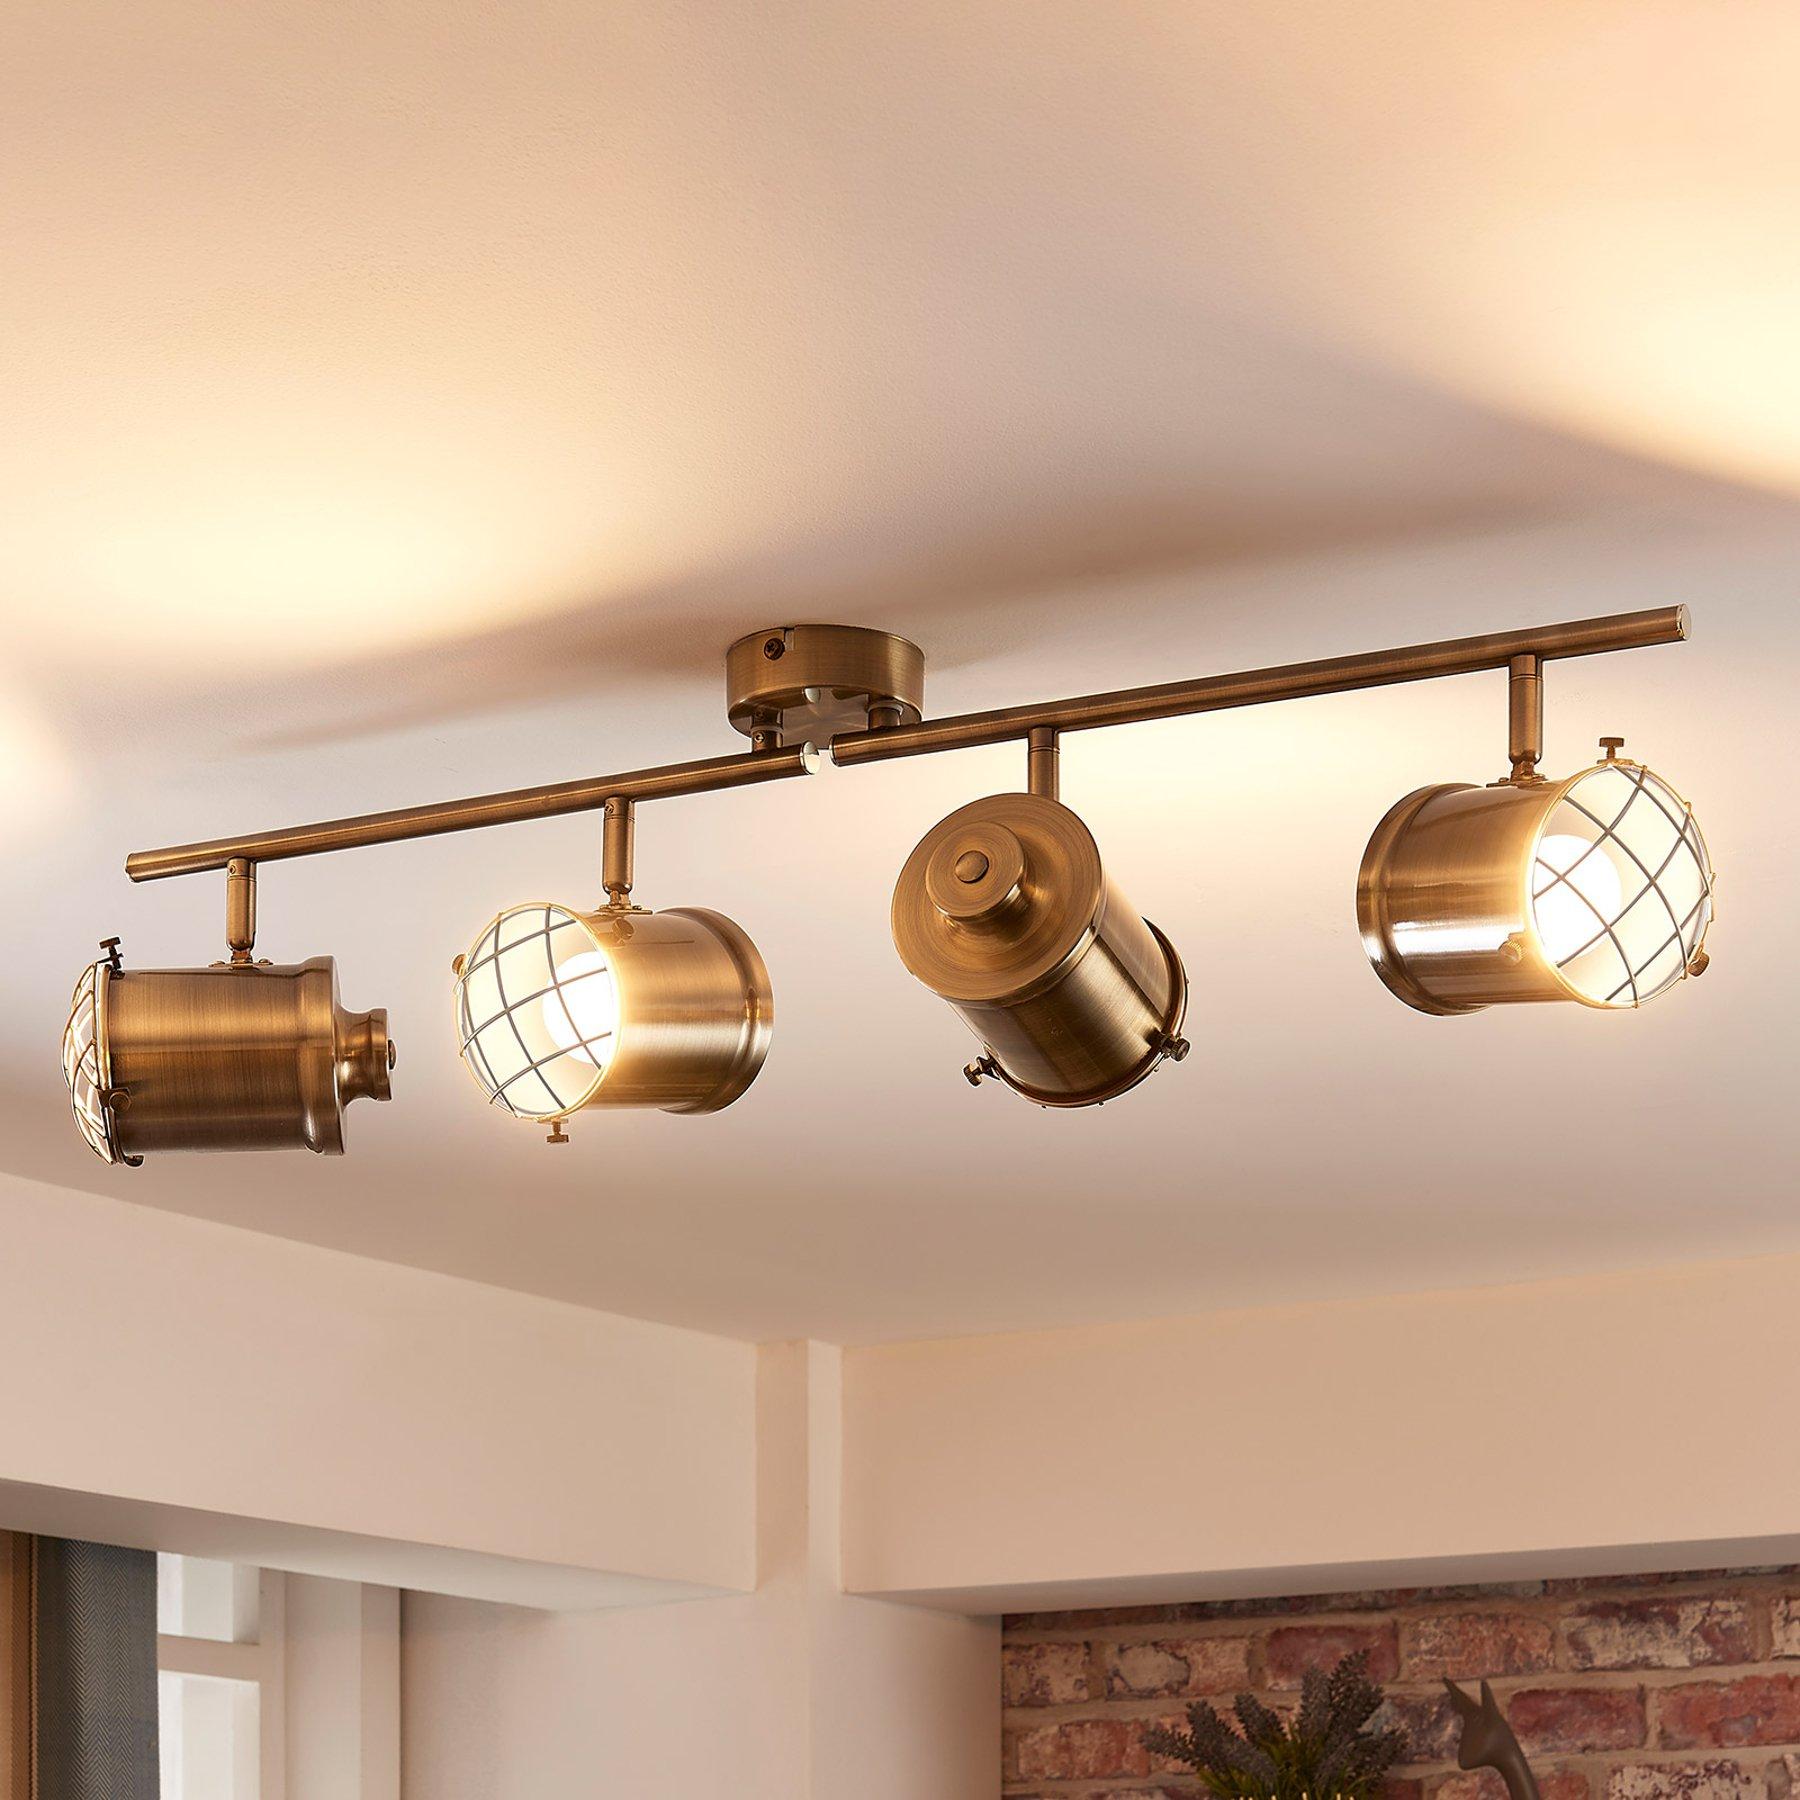 LED-taklampe Ebbi med 4 LED-lys, easydim